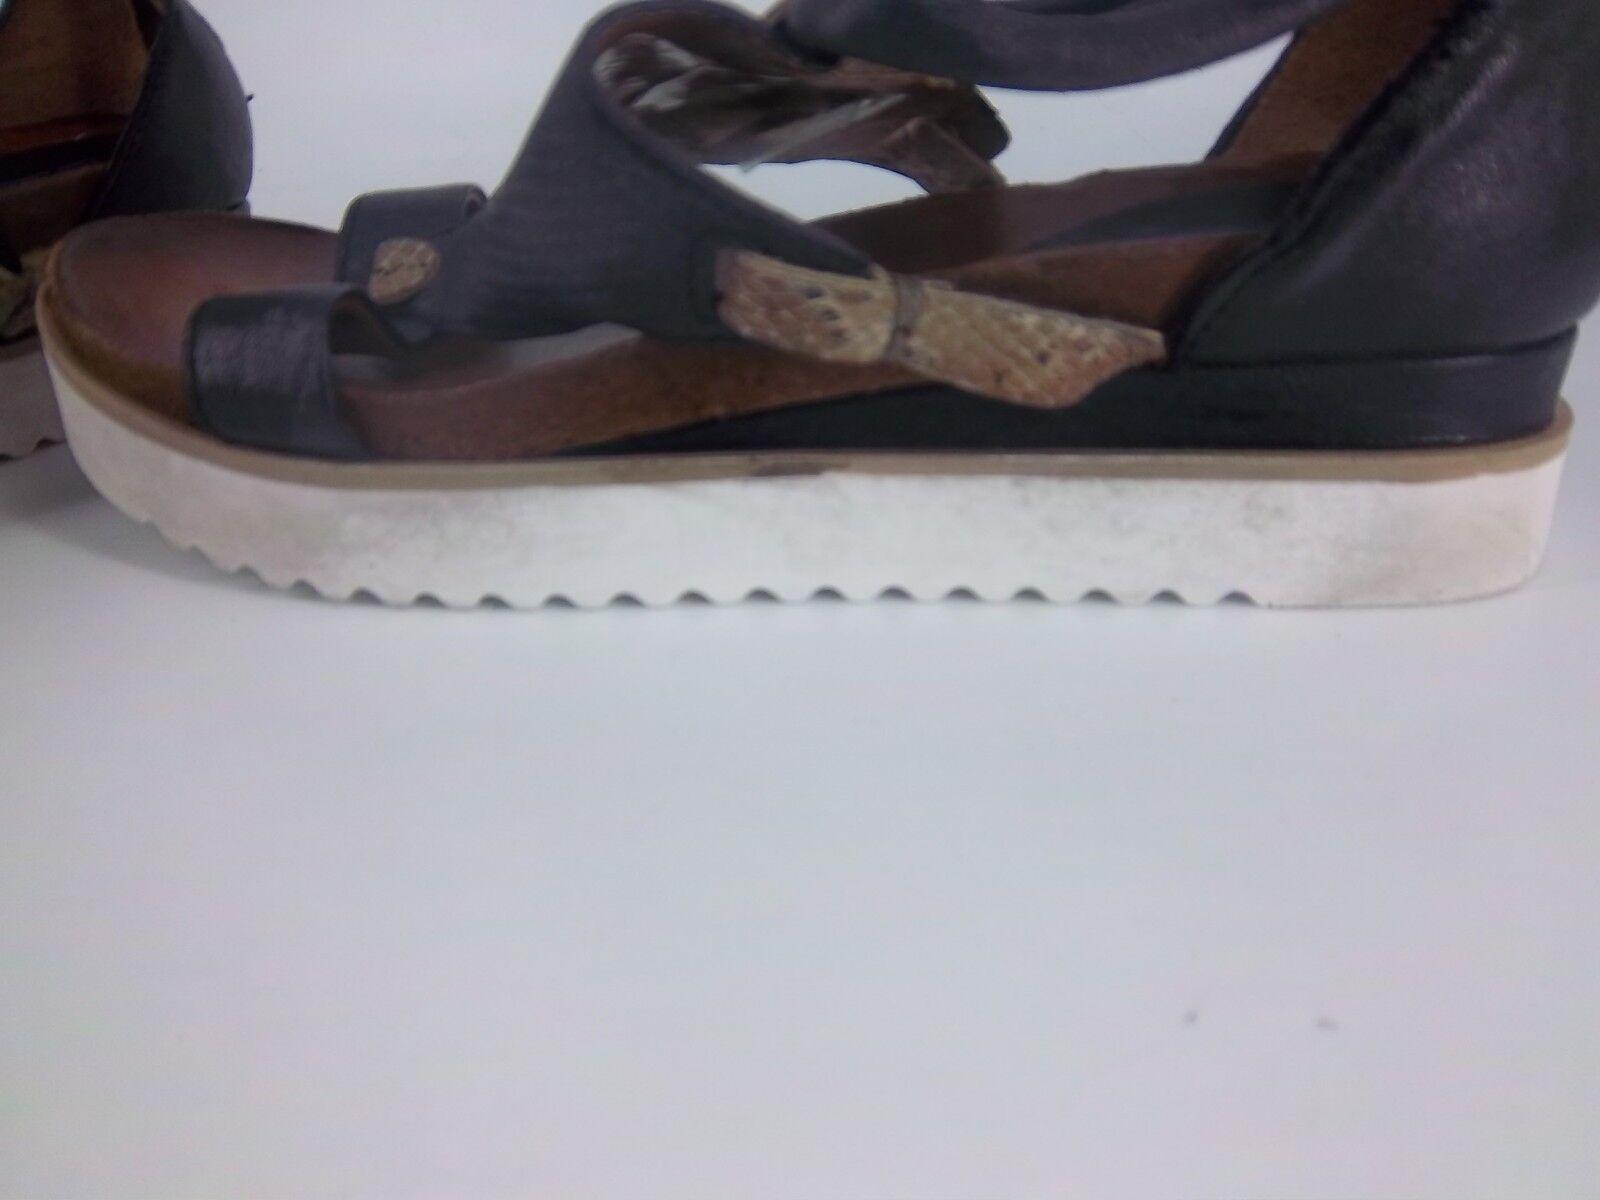 Sandalias Arizona Perforado Cuña Black Size NH087 DD 09